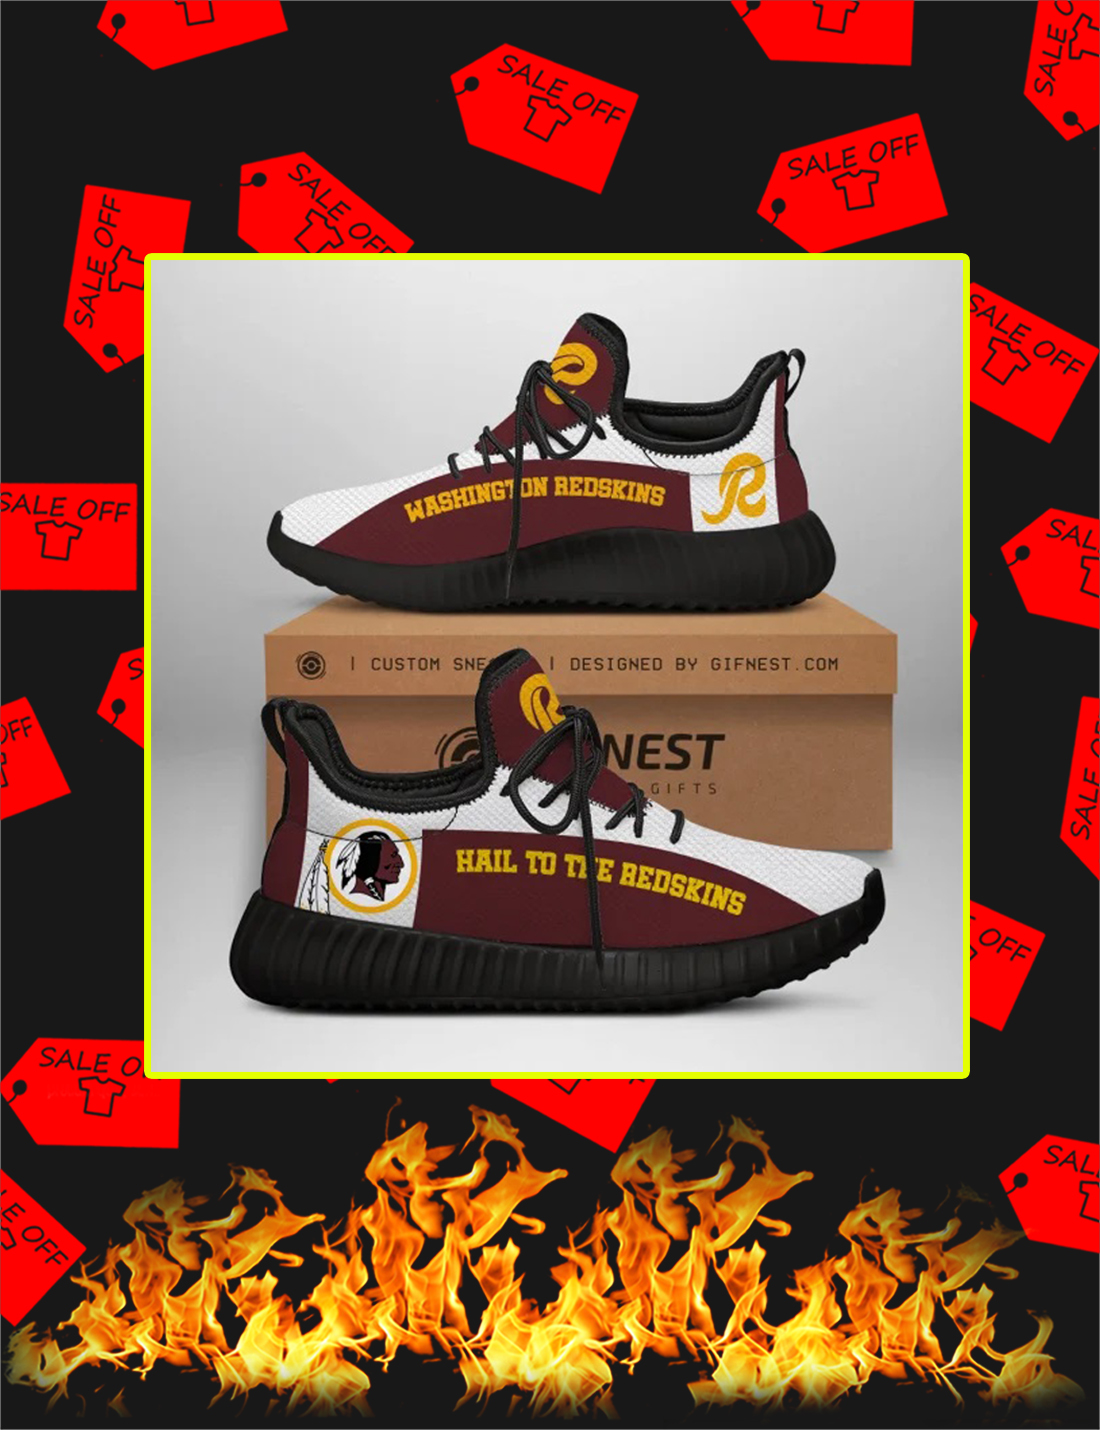 Washington Redskins NFL Yeezy Sneaker - Picture 3